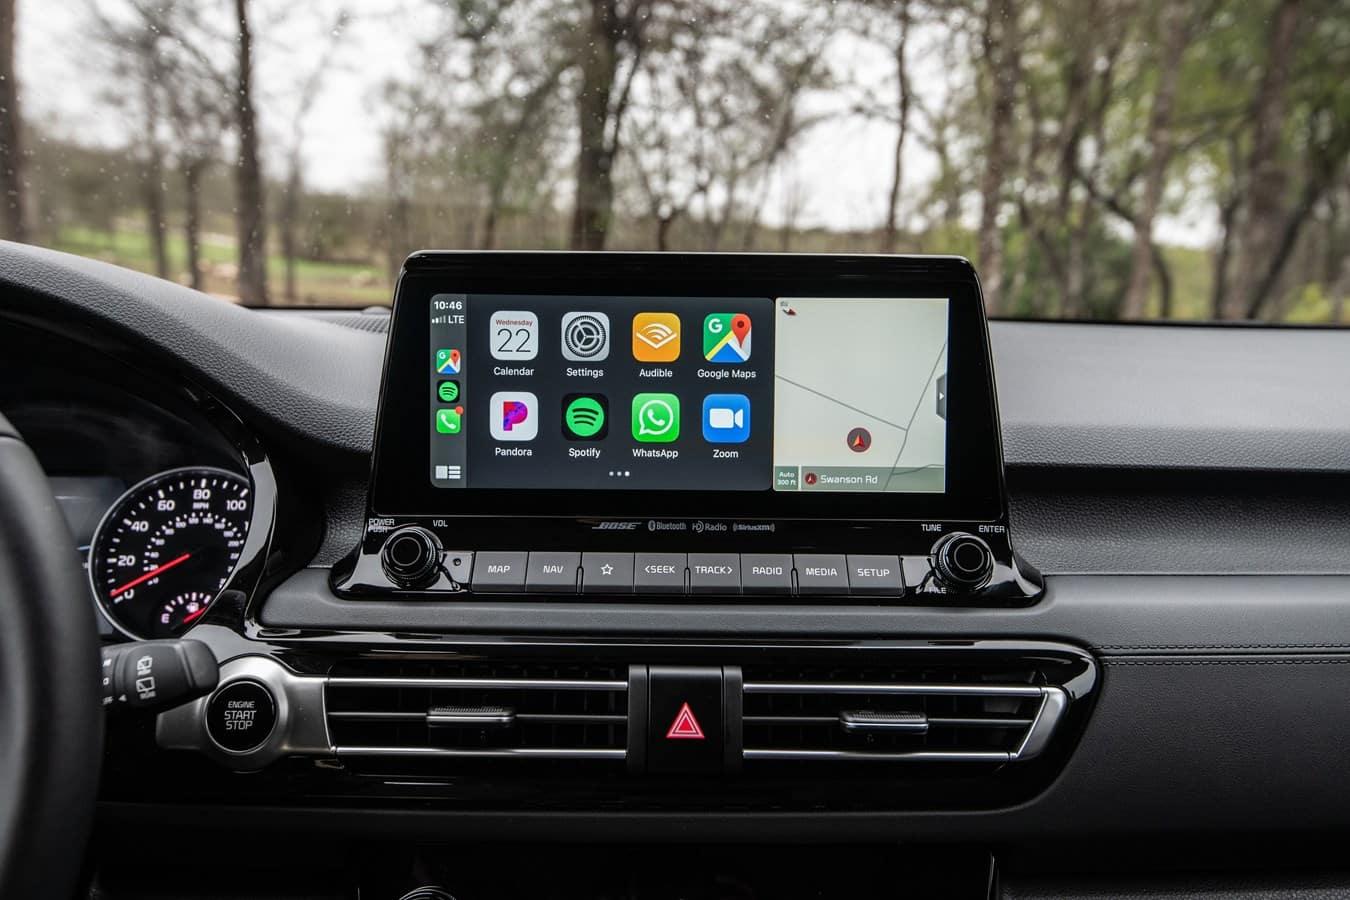 2022 Kia Seltos Apple CarPlay Cowboy Kia